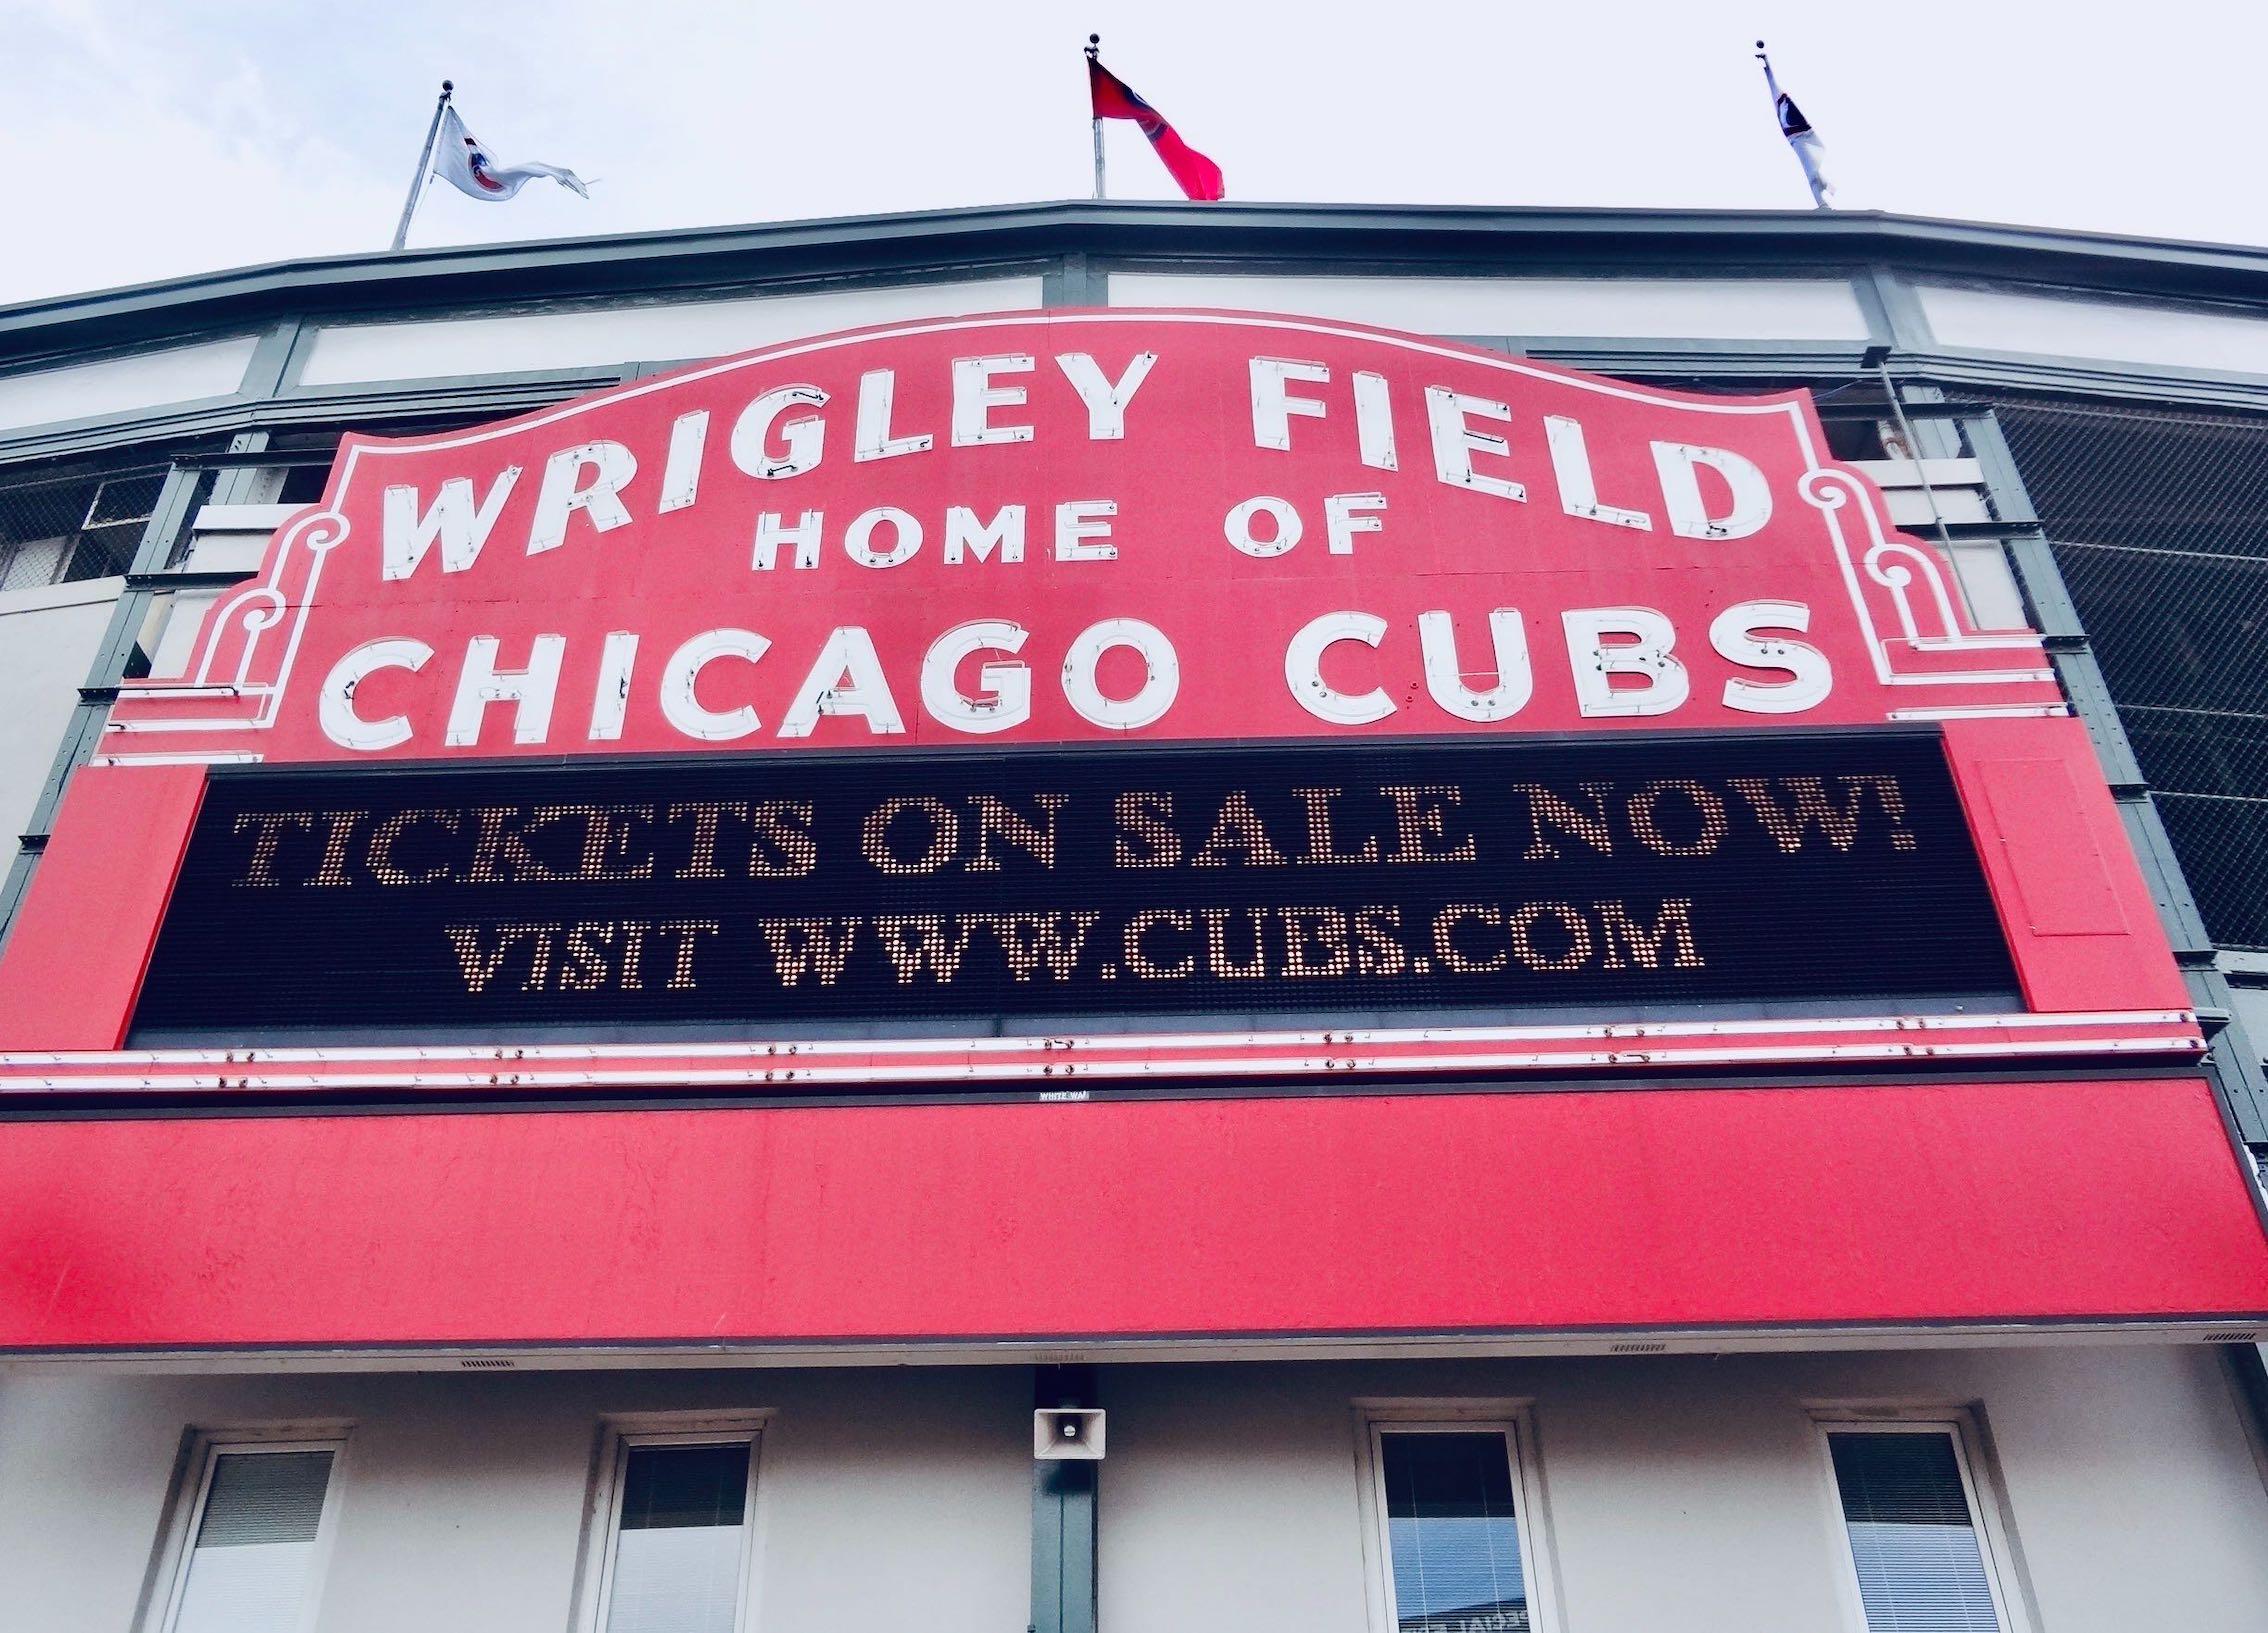 Wrigley Field Baseball Stadium in Chicago